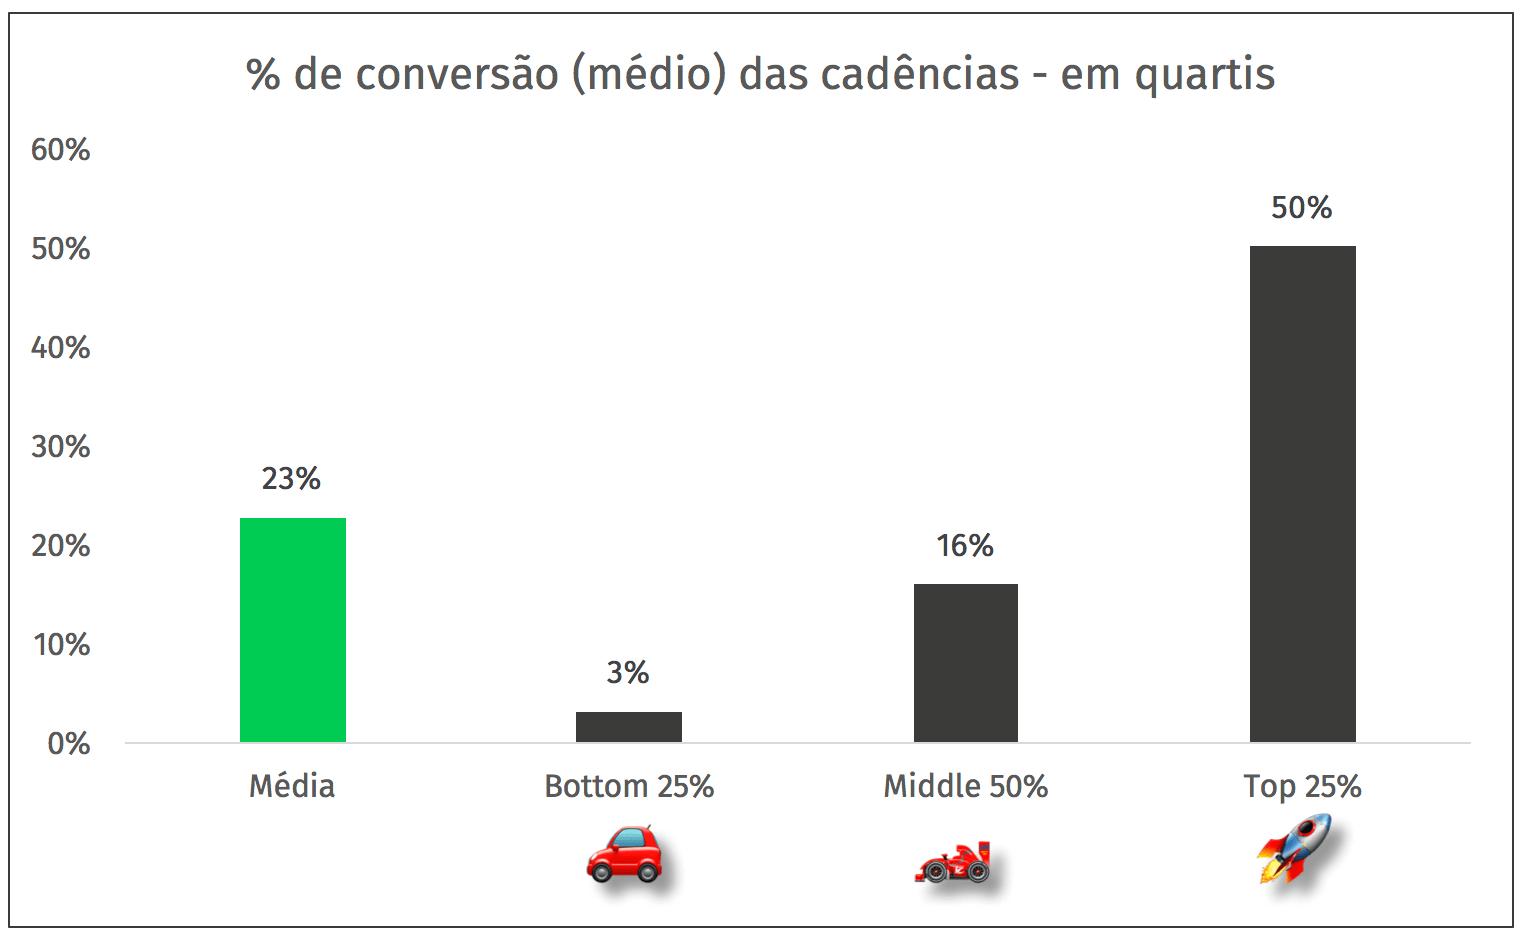 percentual de conversao cadencia